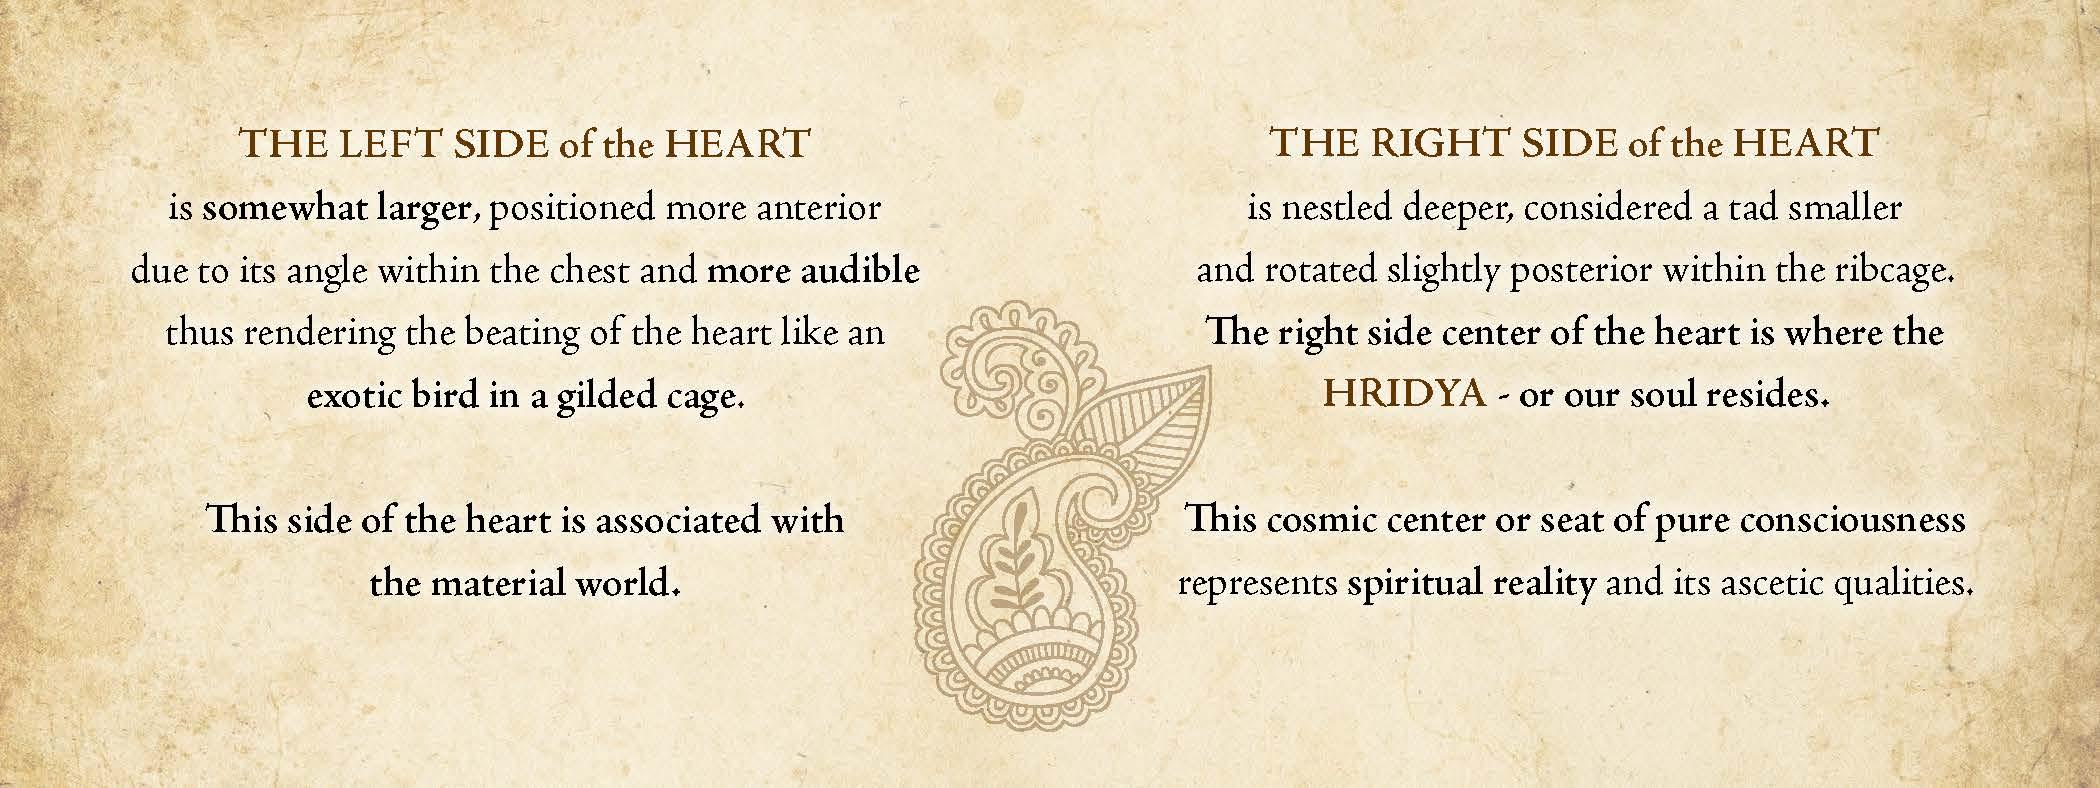 Vyana heart book2 (1)_Page_6.jpg